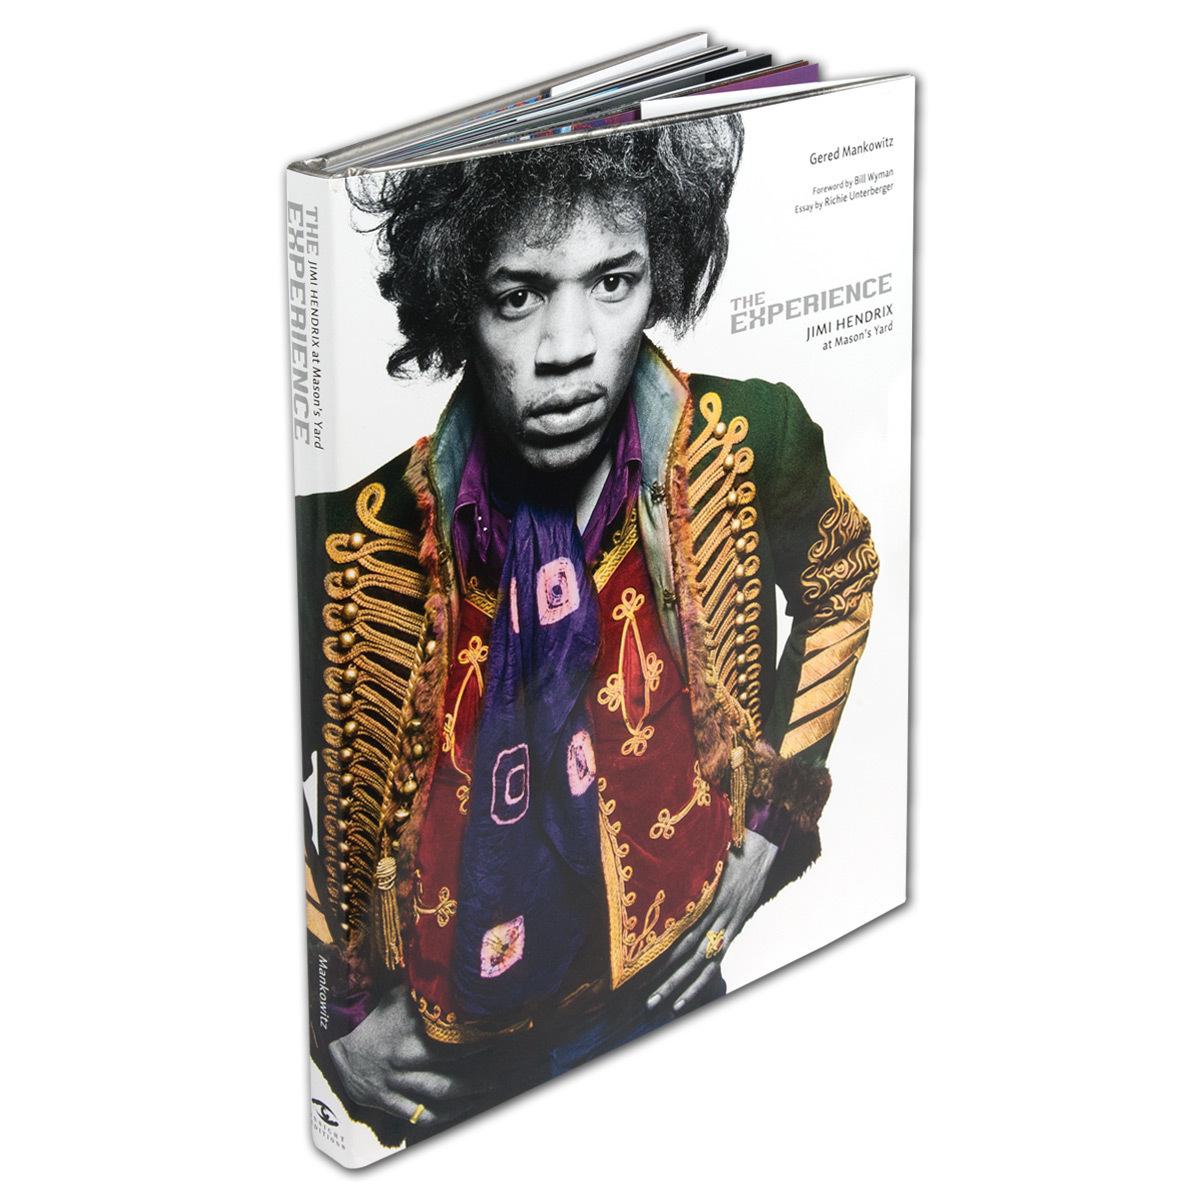 Jimi Hendrix: The Experience at Masons Yard Book